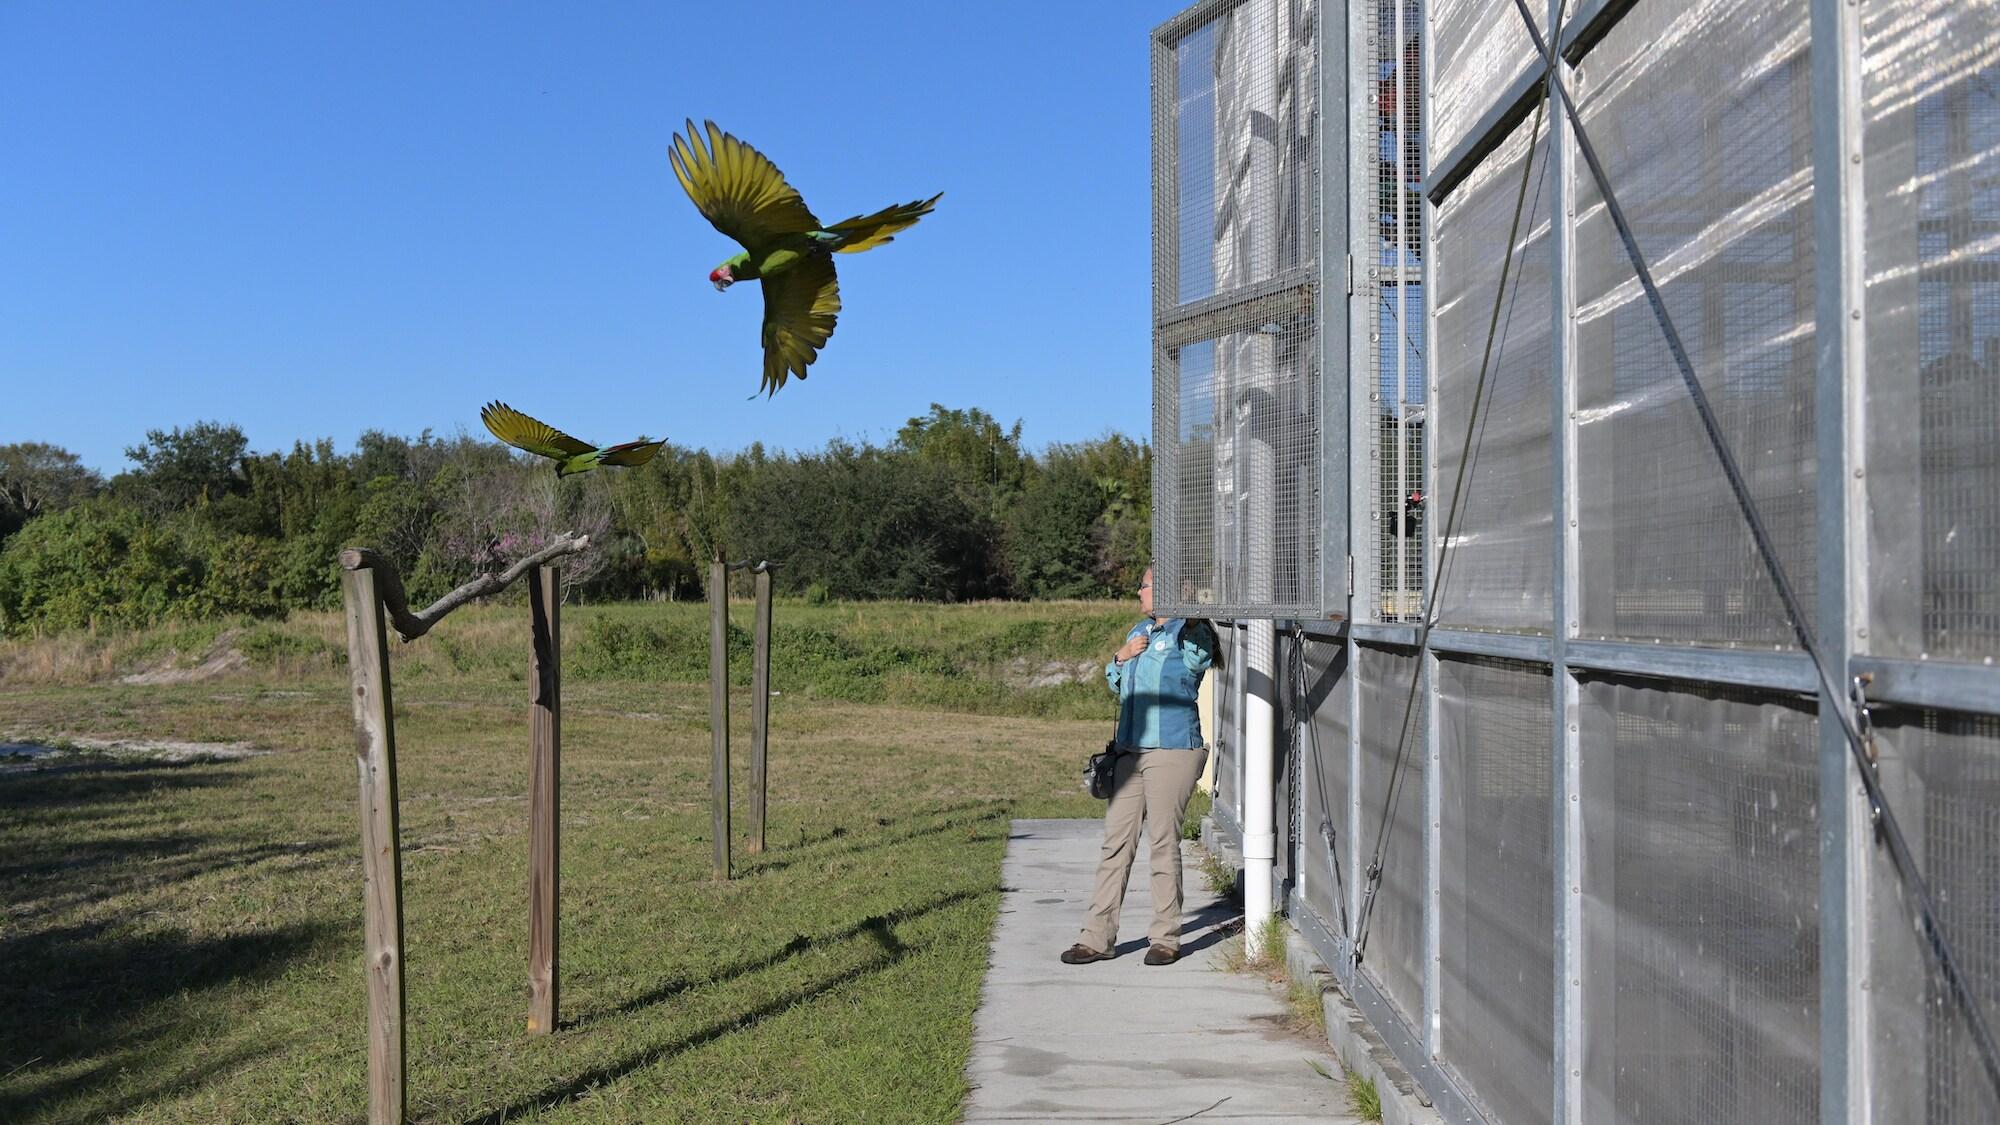 Arbor Military Macaw flies into the sky. (Charlene Guilliams/Disney)